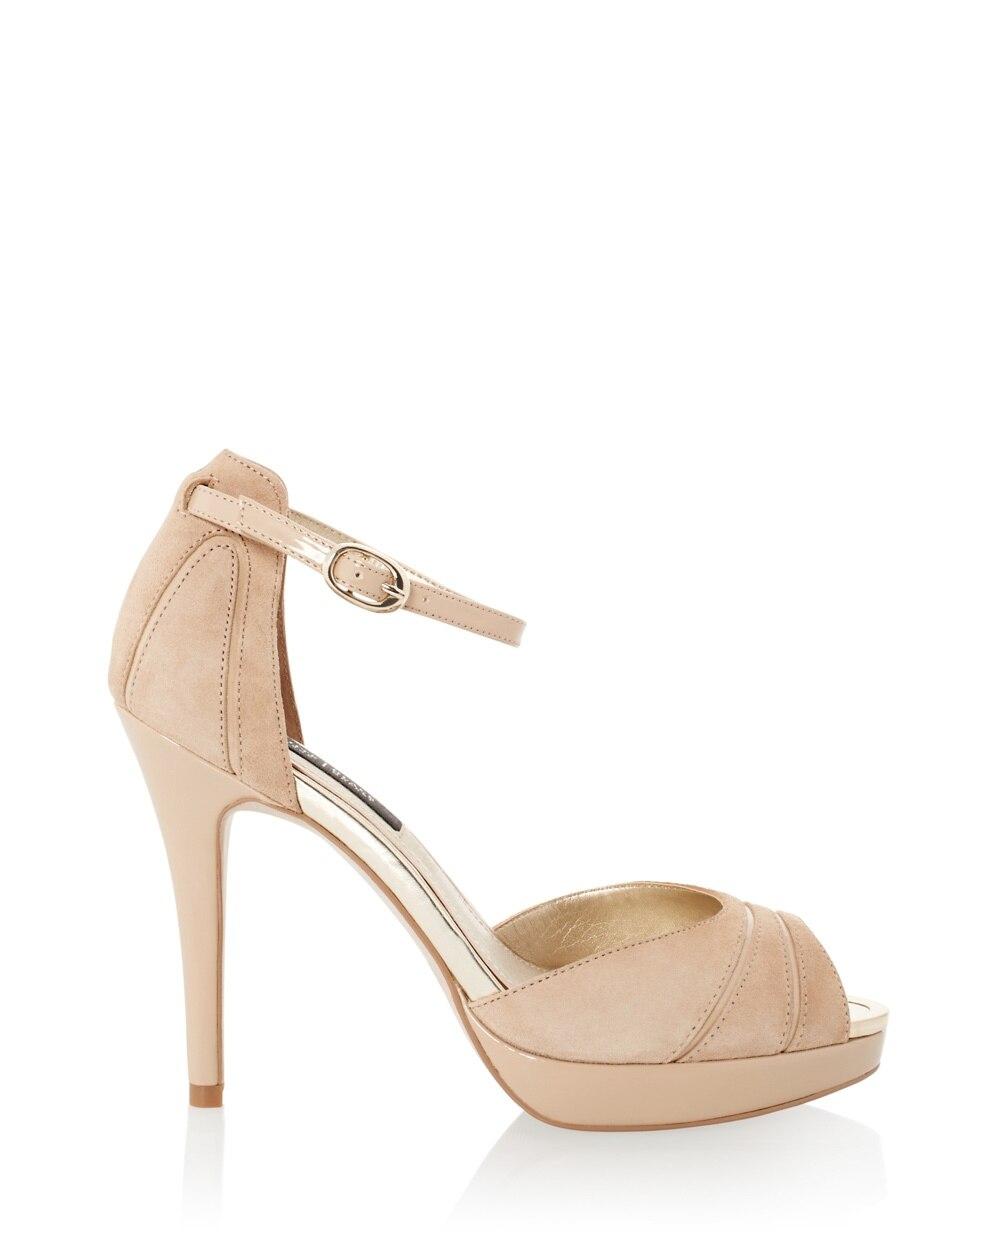 black peep toe ankle strap heels